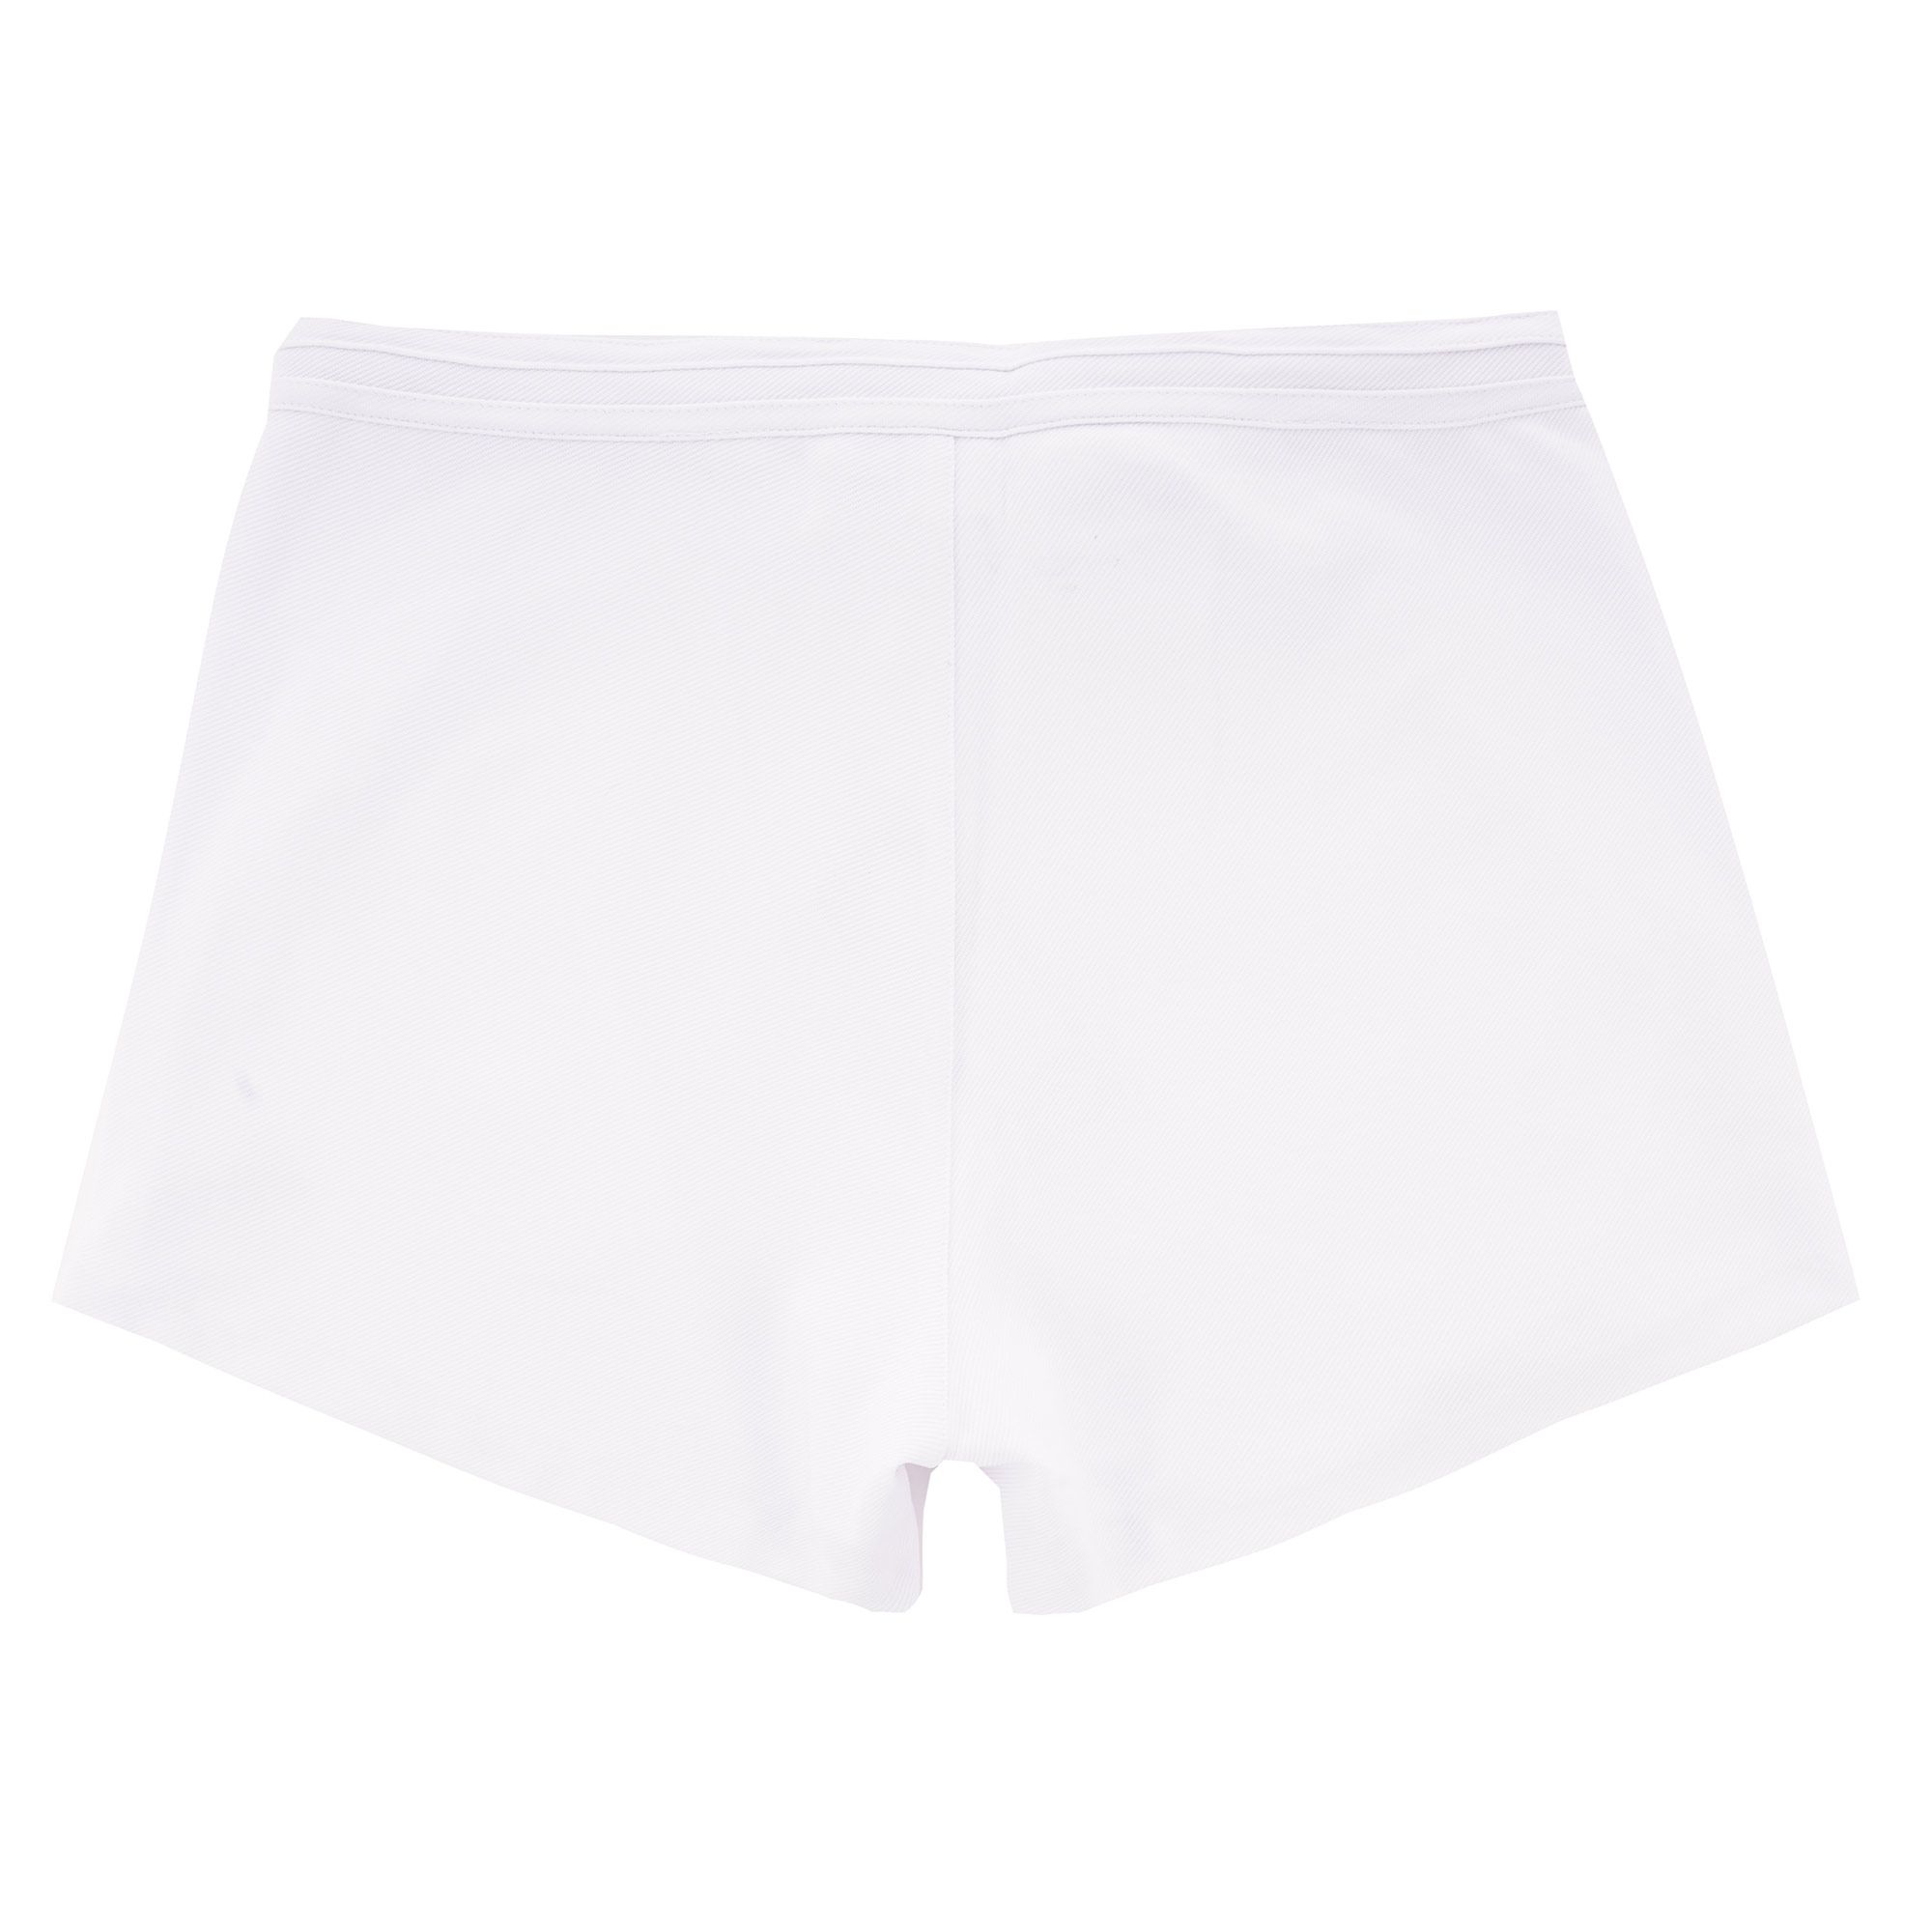 d2ecd9ebab7e6 Sergio Tacchini Time Shorts | White | 37572